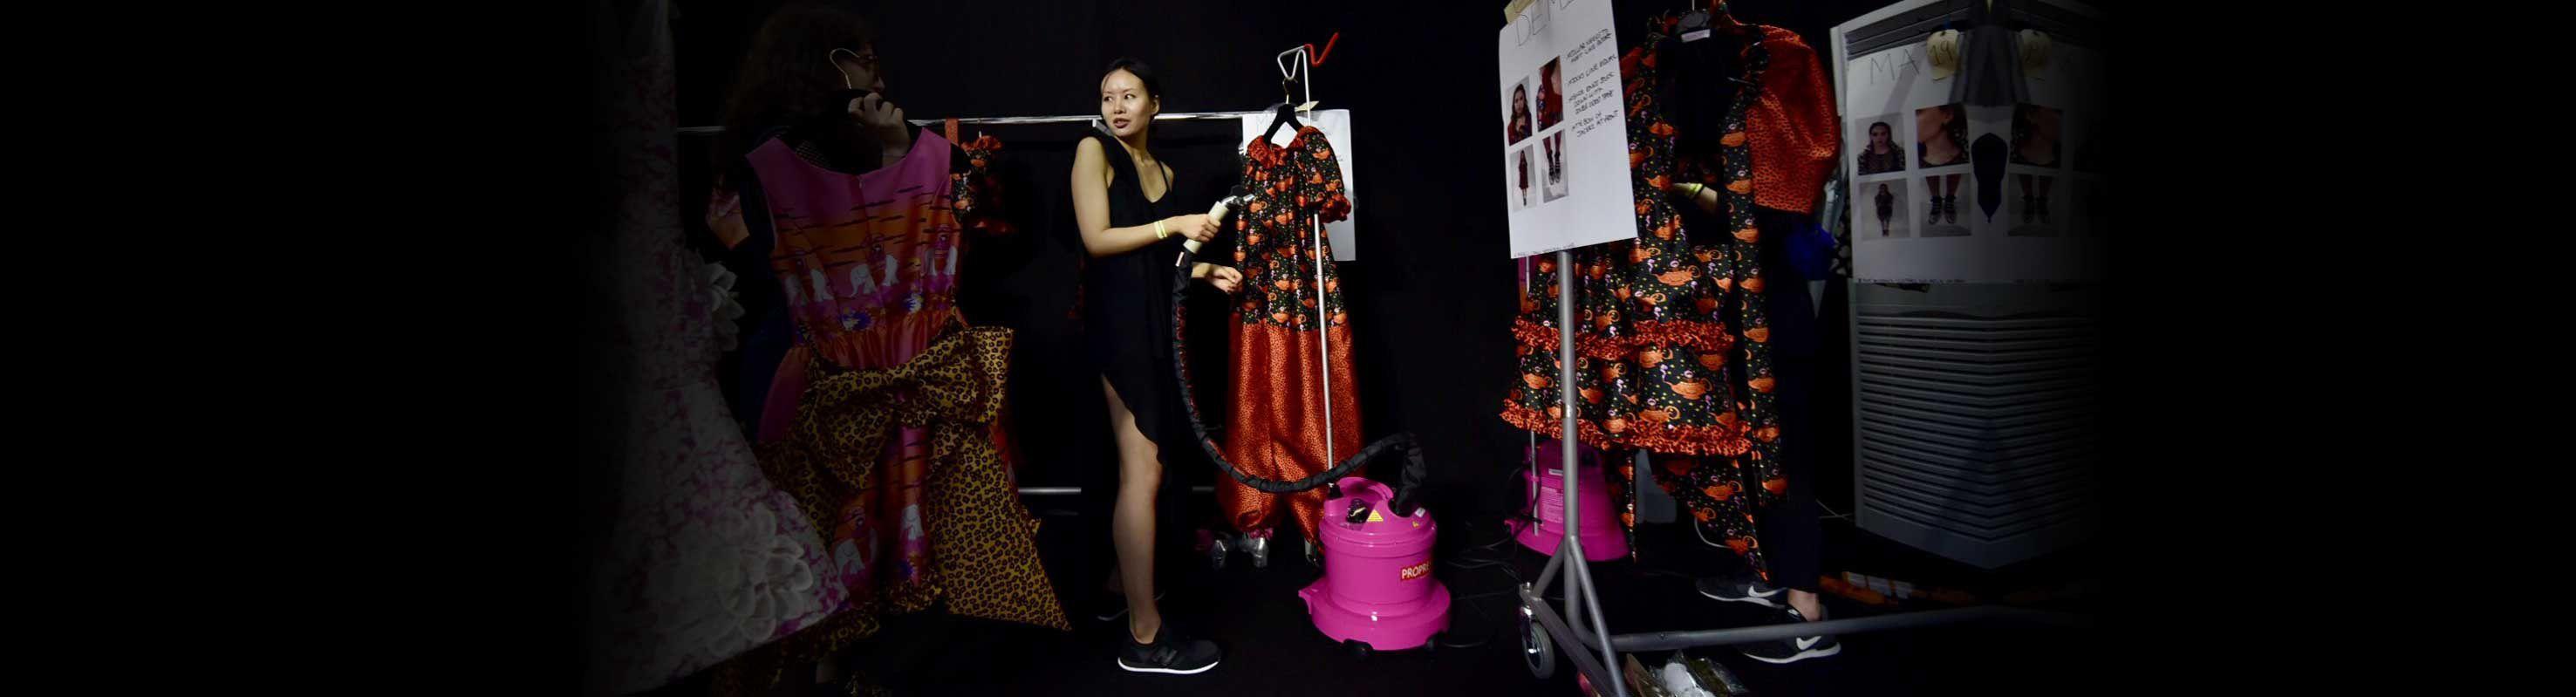 Lady using PRO580P Pink steamer backstage at London Fashion Week